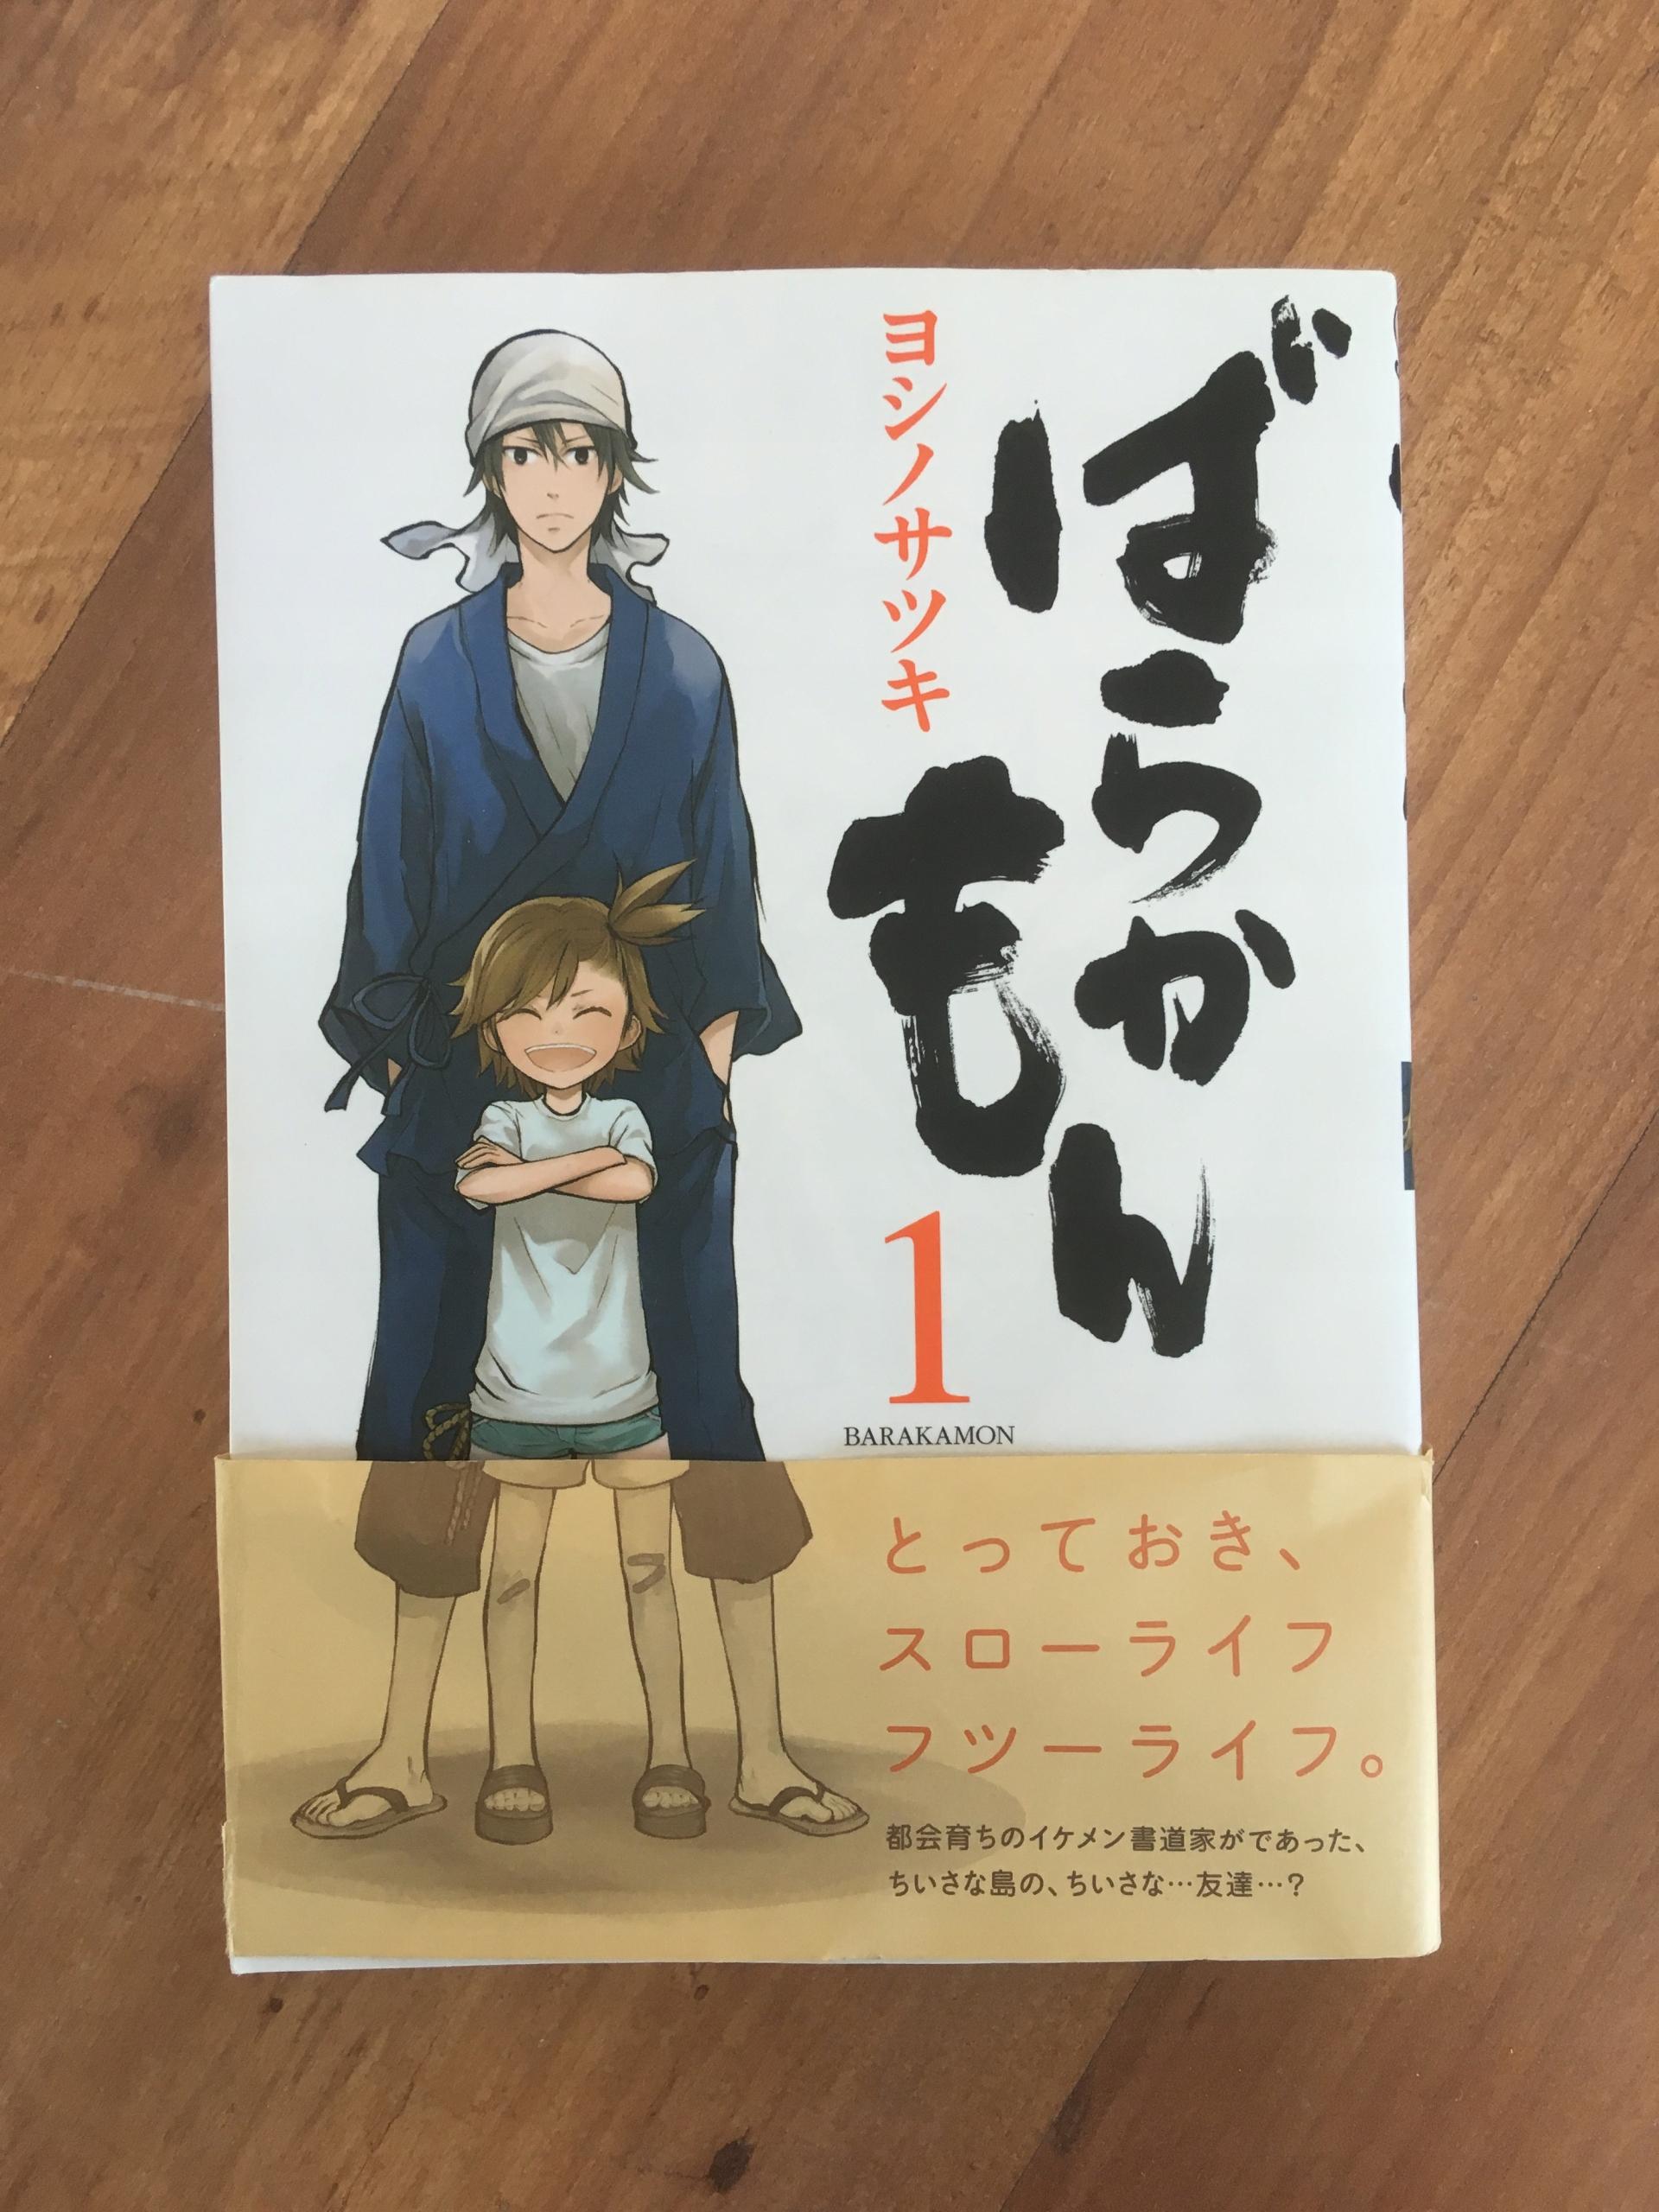 BARAKAMON japoński manga naruto one piece